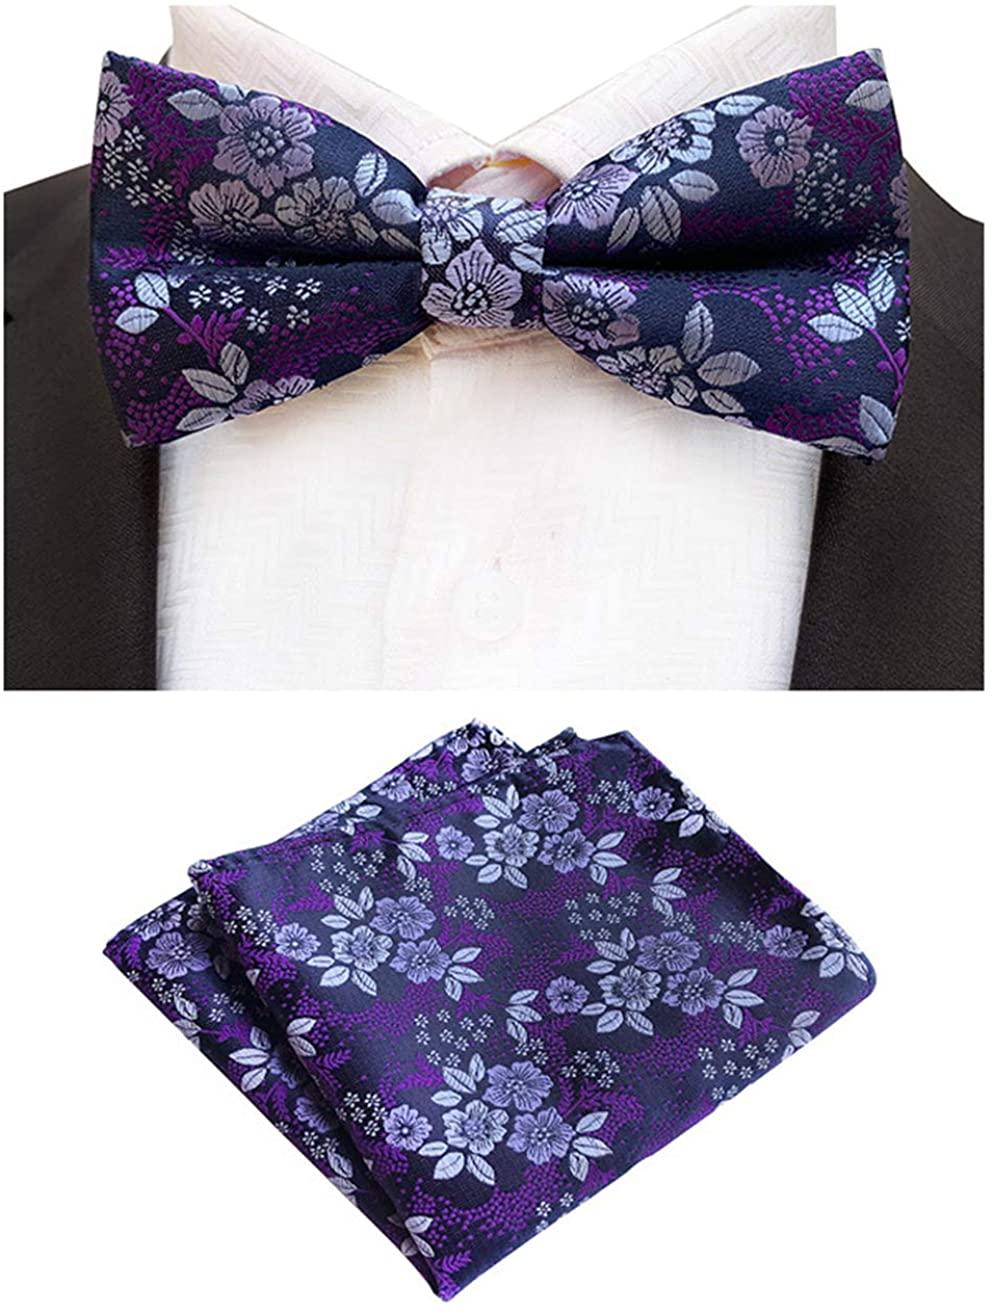 MOHSLEE Adjustable Pre-Tied Bow Tie Pocket Square Set Jacquard Silk Wedding Suit